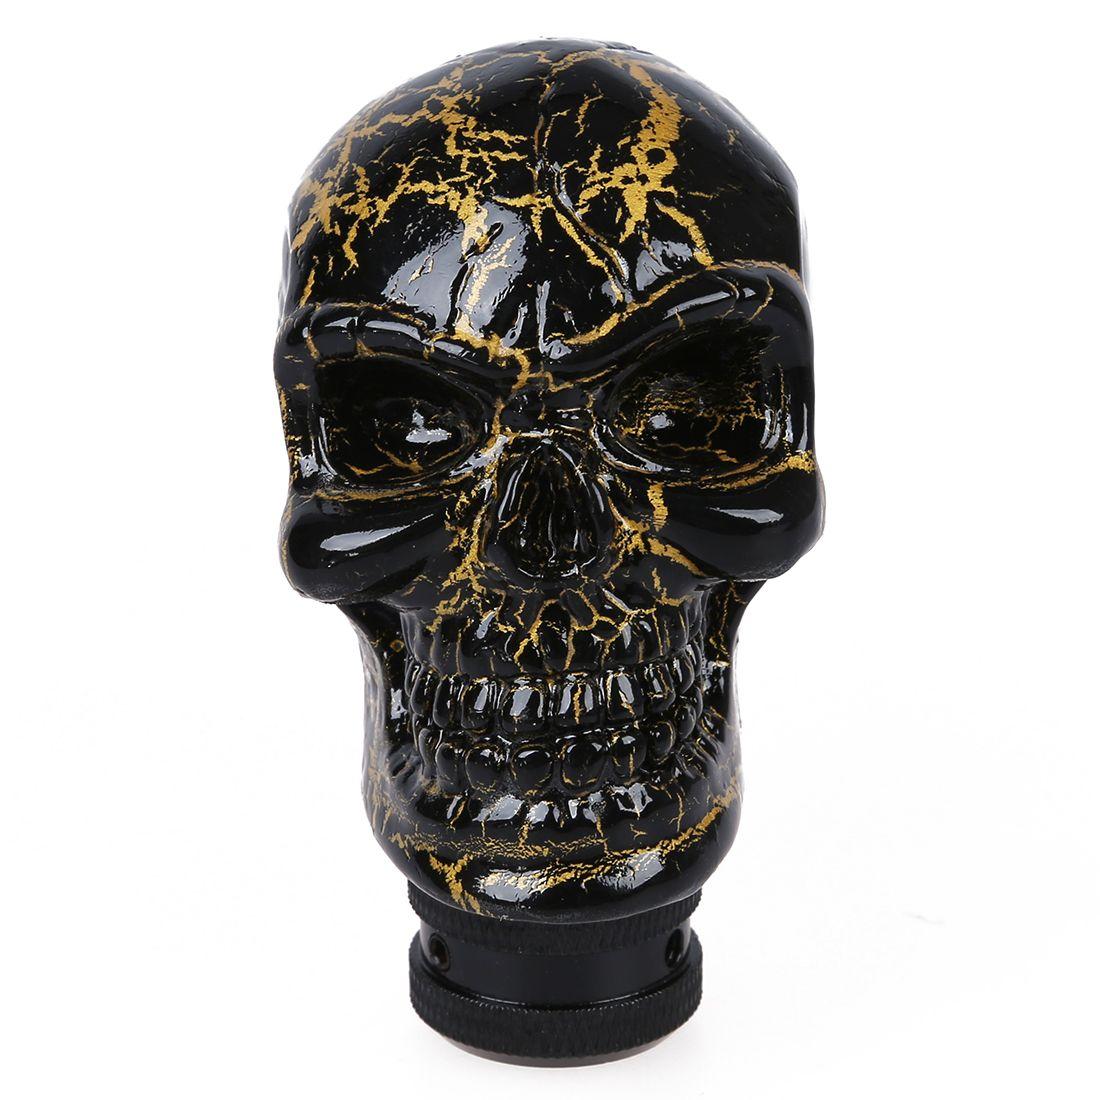 Auto Car Black Gold Tone Skull Head Style Ceramic Gear Shift Knob decoration